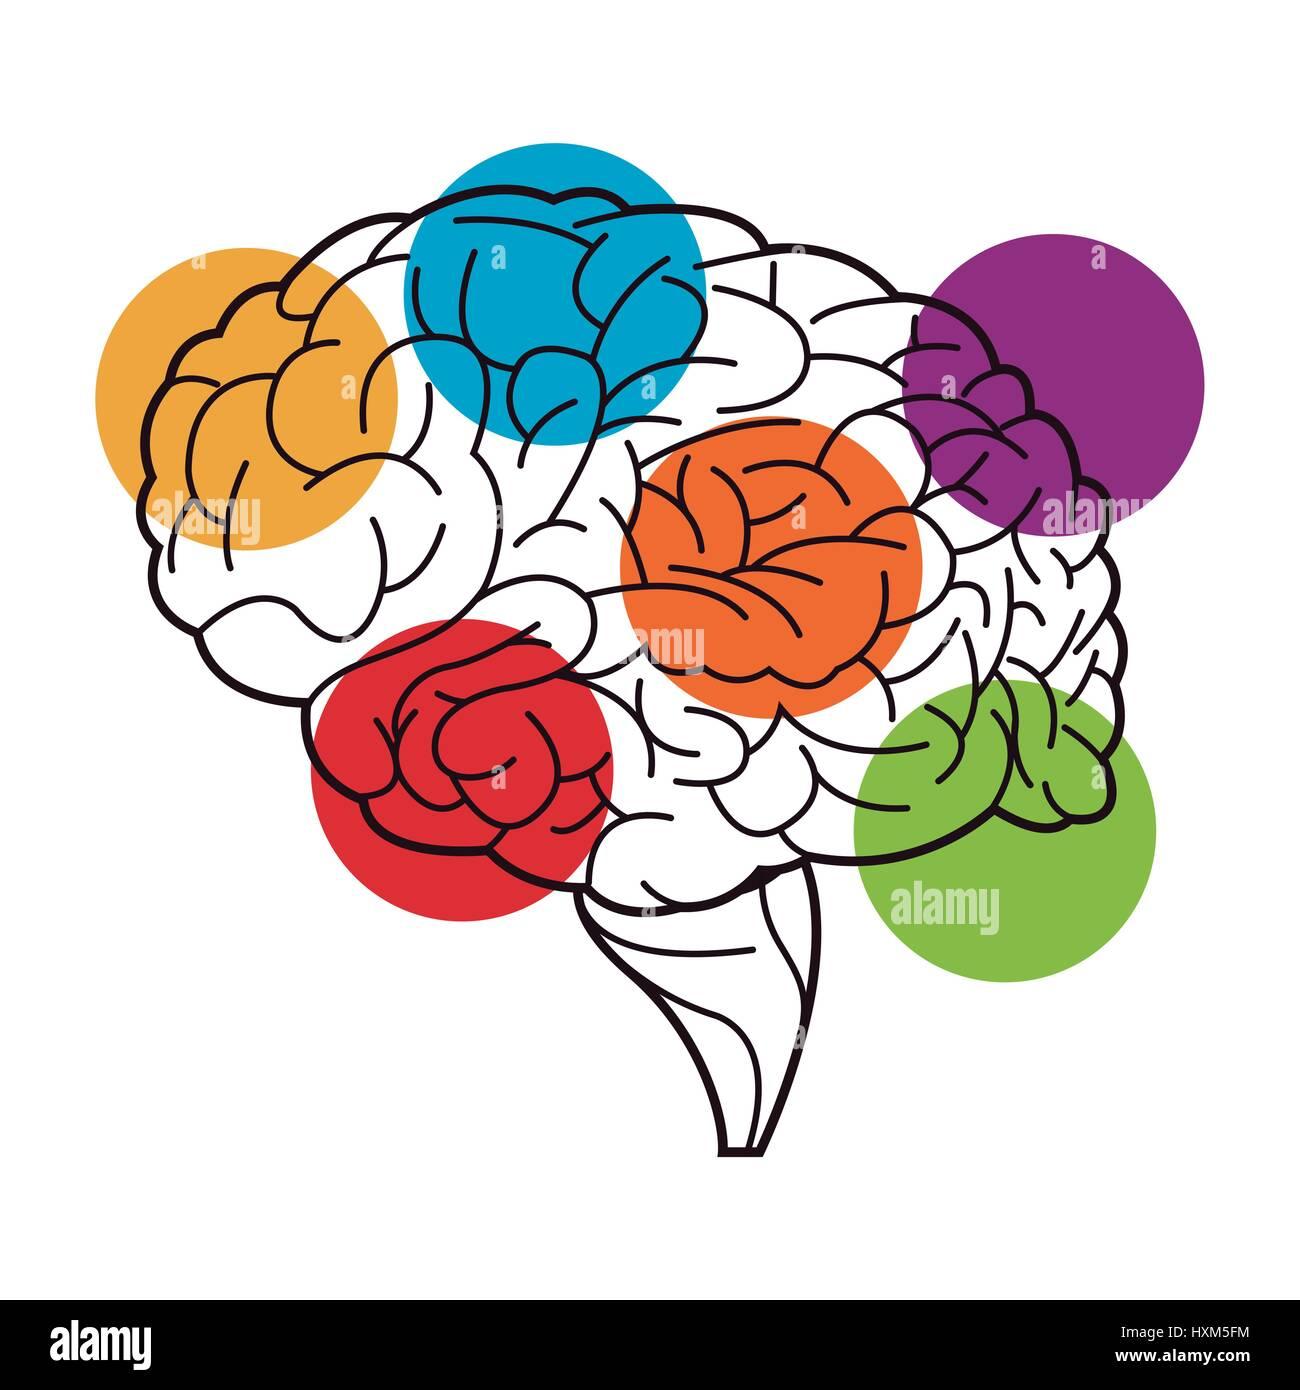 human brain process functions image - Stock Image